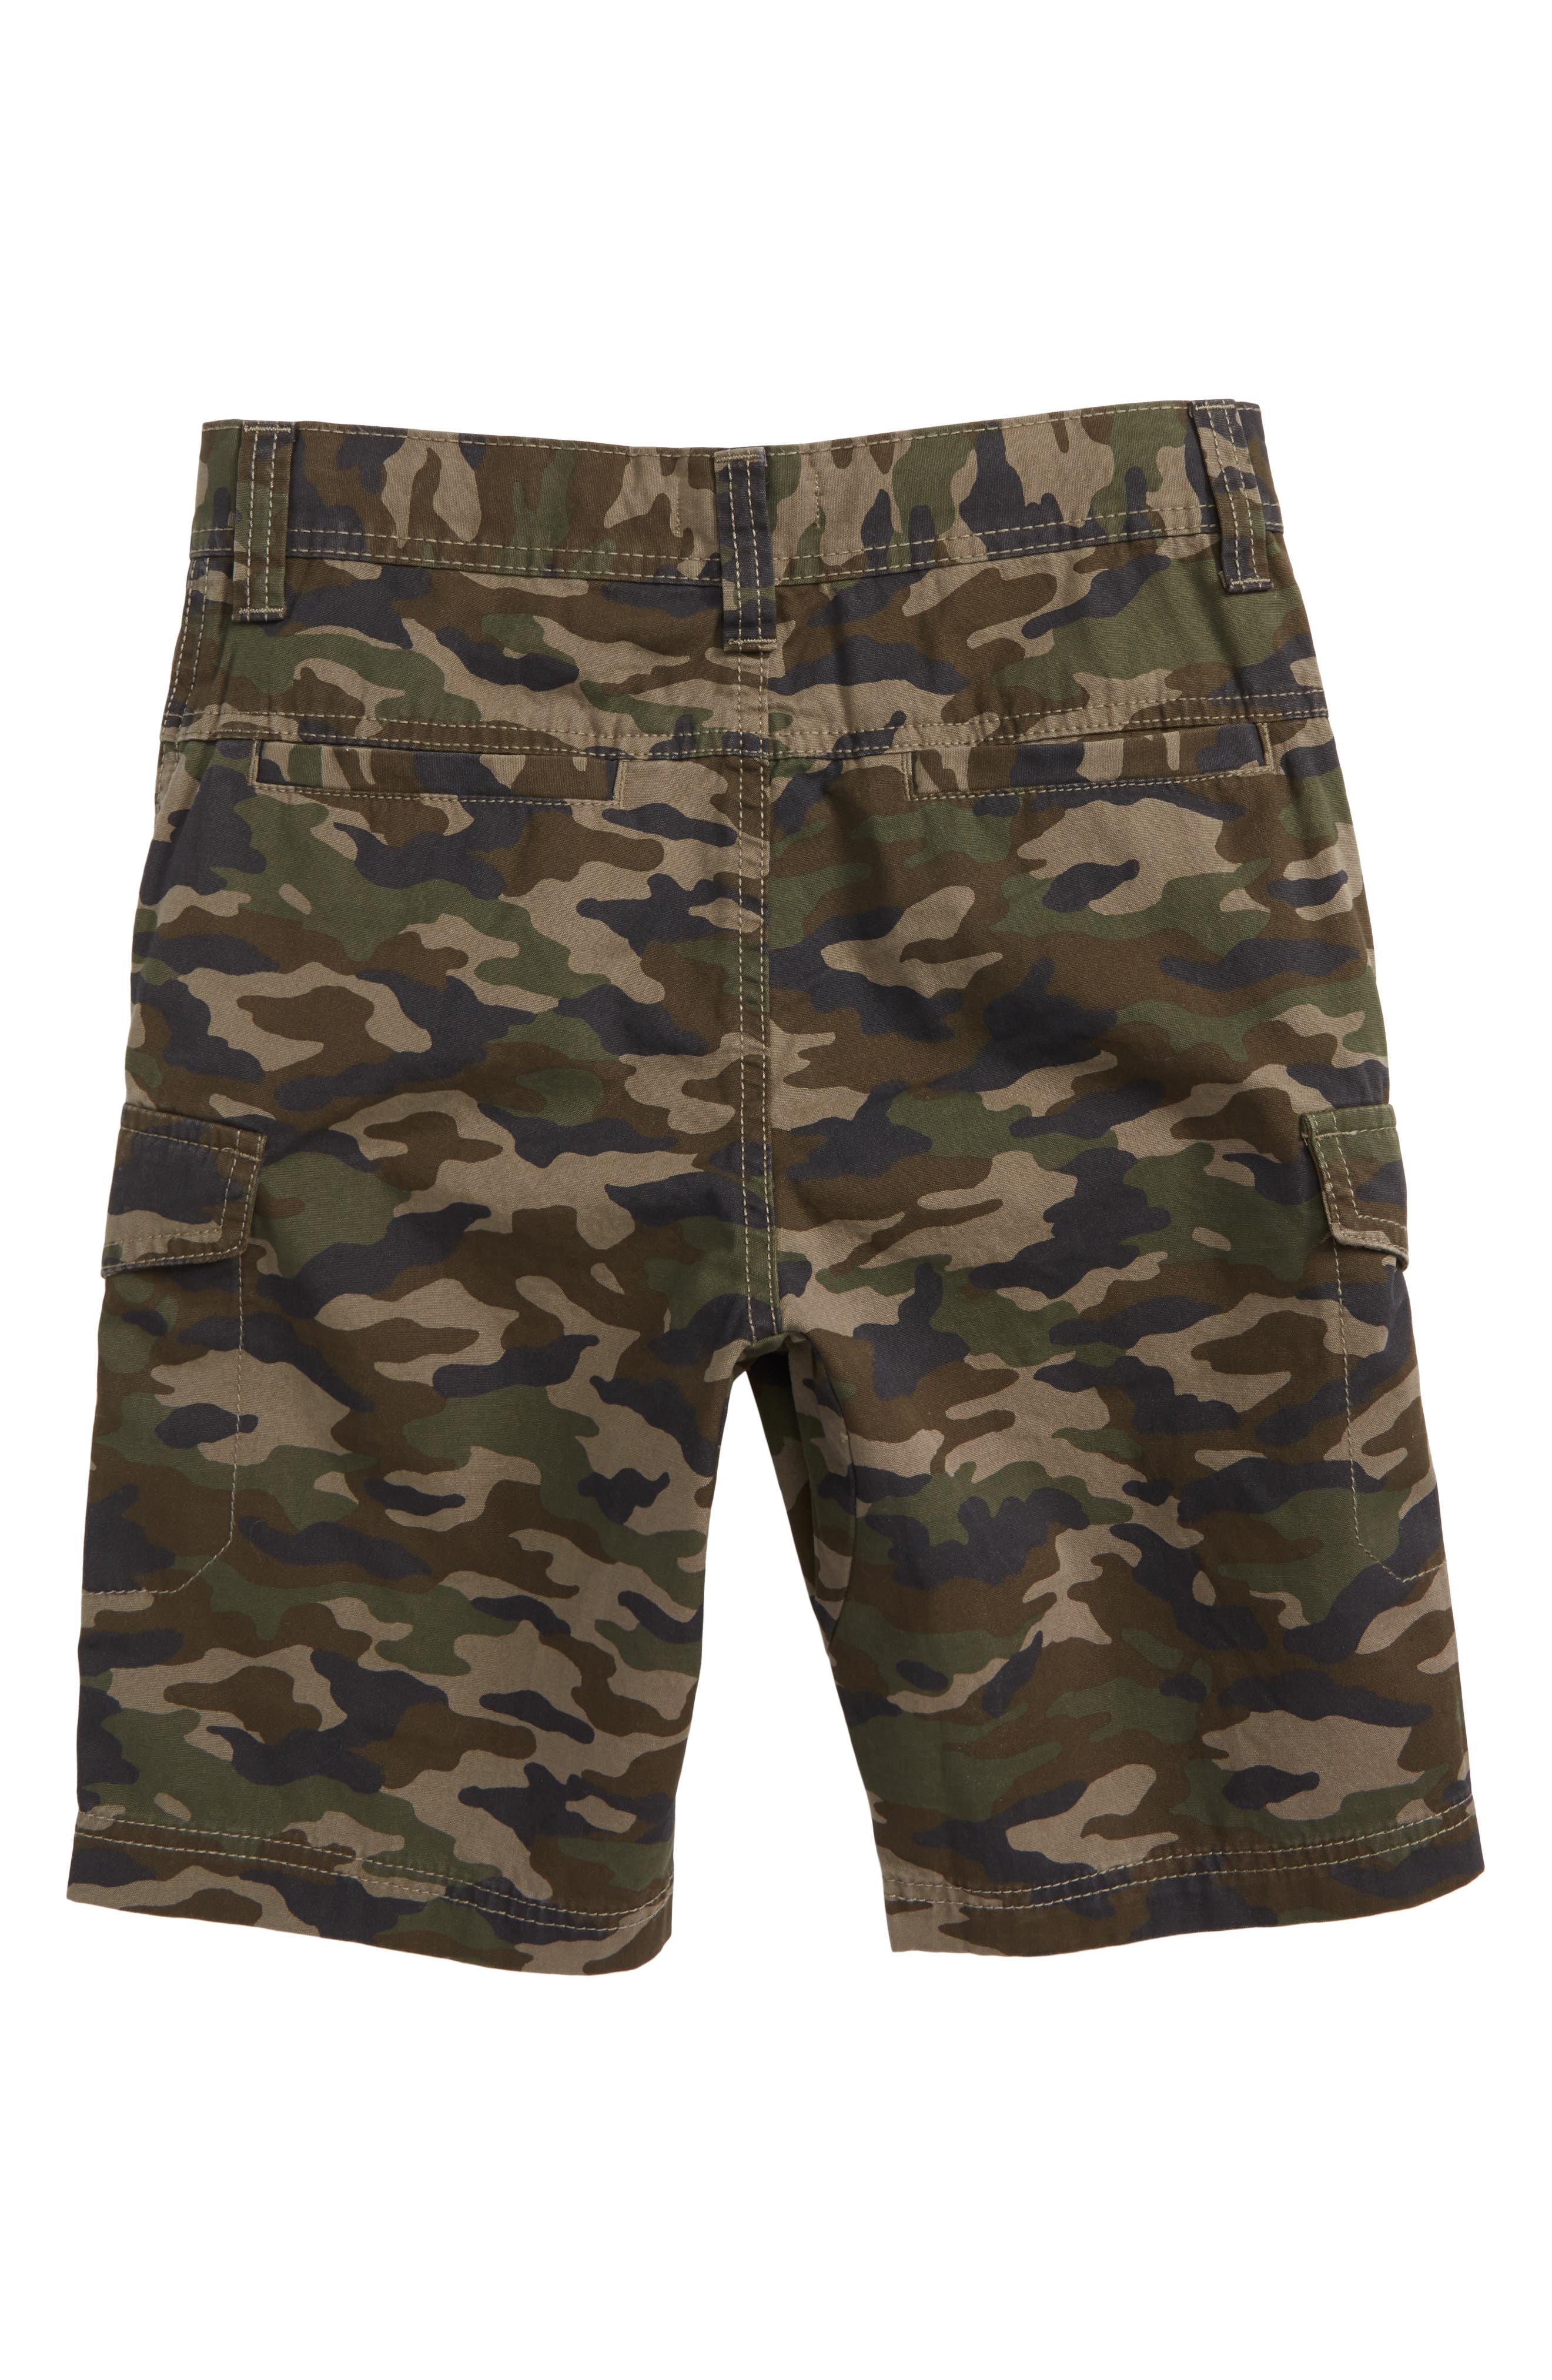 Camo Cargo Shorts,                             Alternate thumbnail 2, color,                             Olive Brown Camo